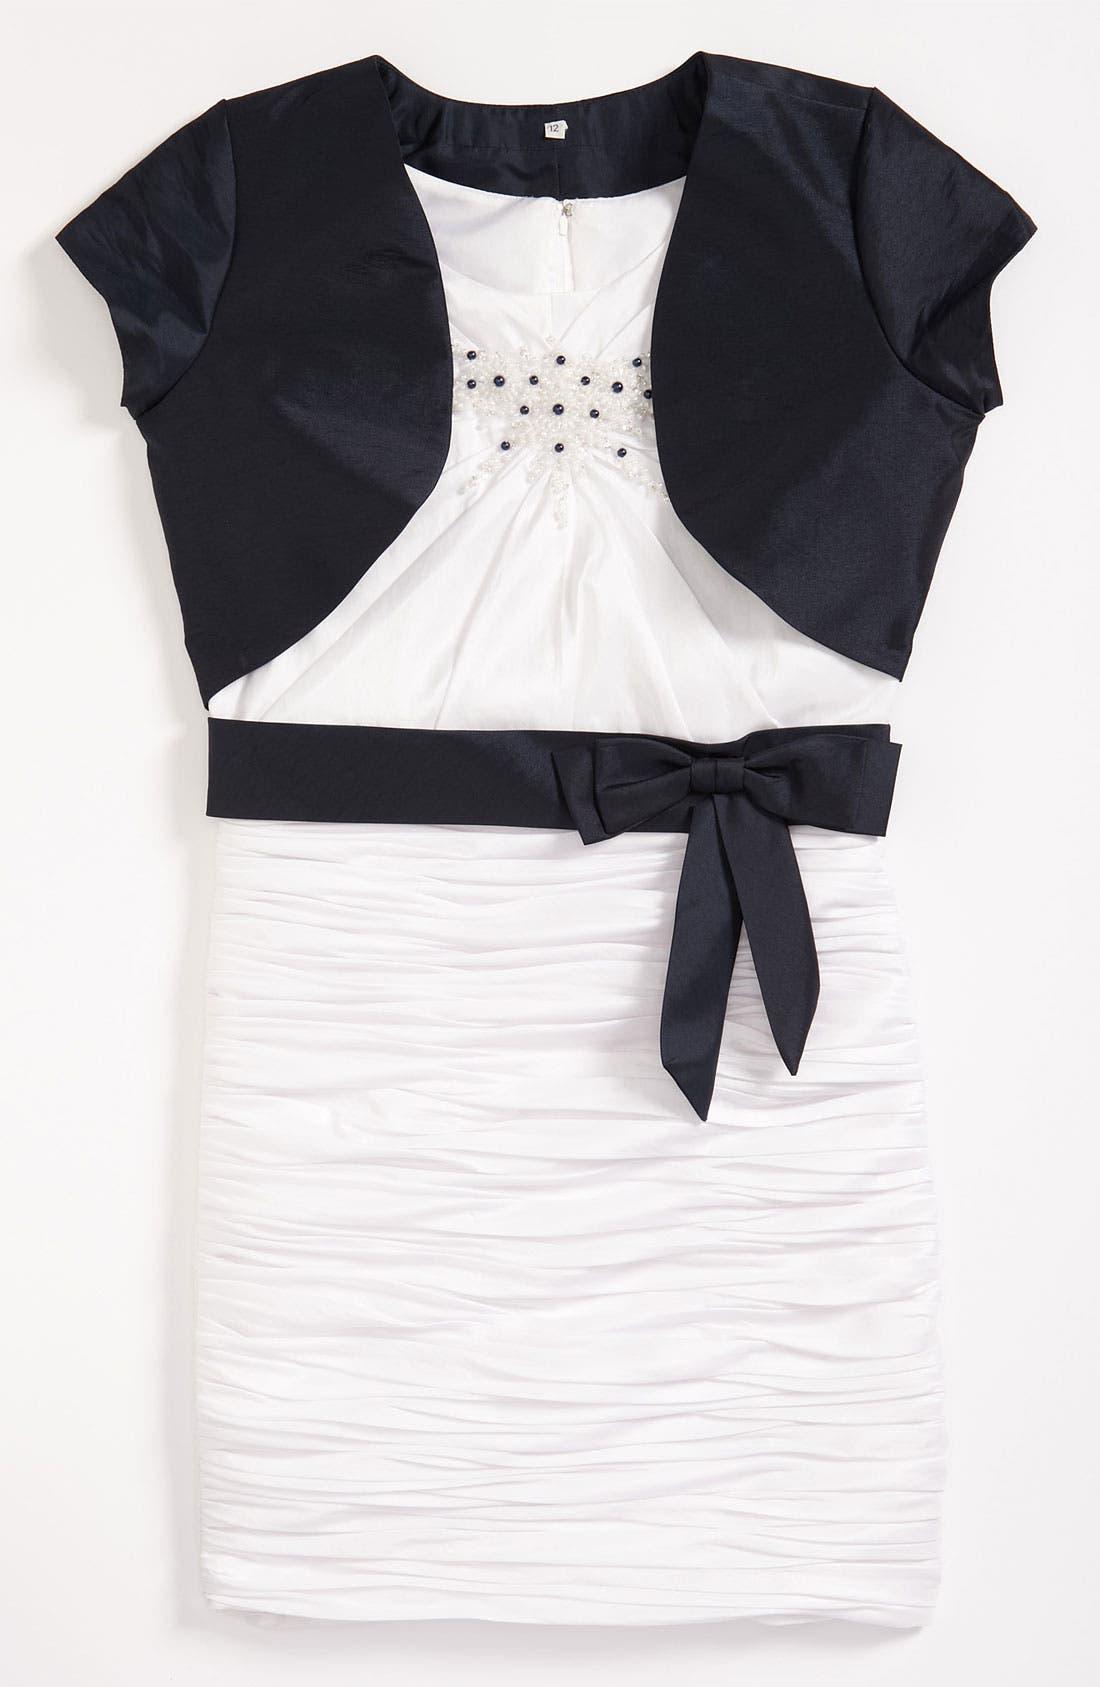 Alternate Image 1 Selected - Joan Calabrese for Mon Cheri Taffeta Dress & Bolero (Big Girls)